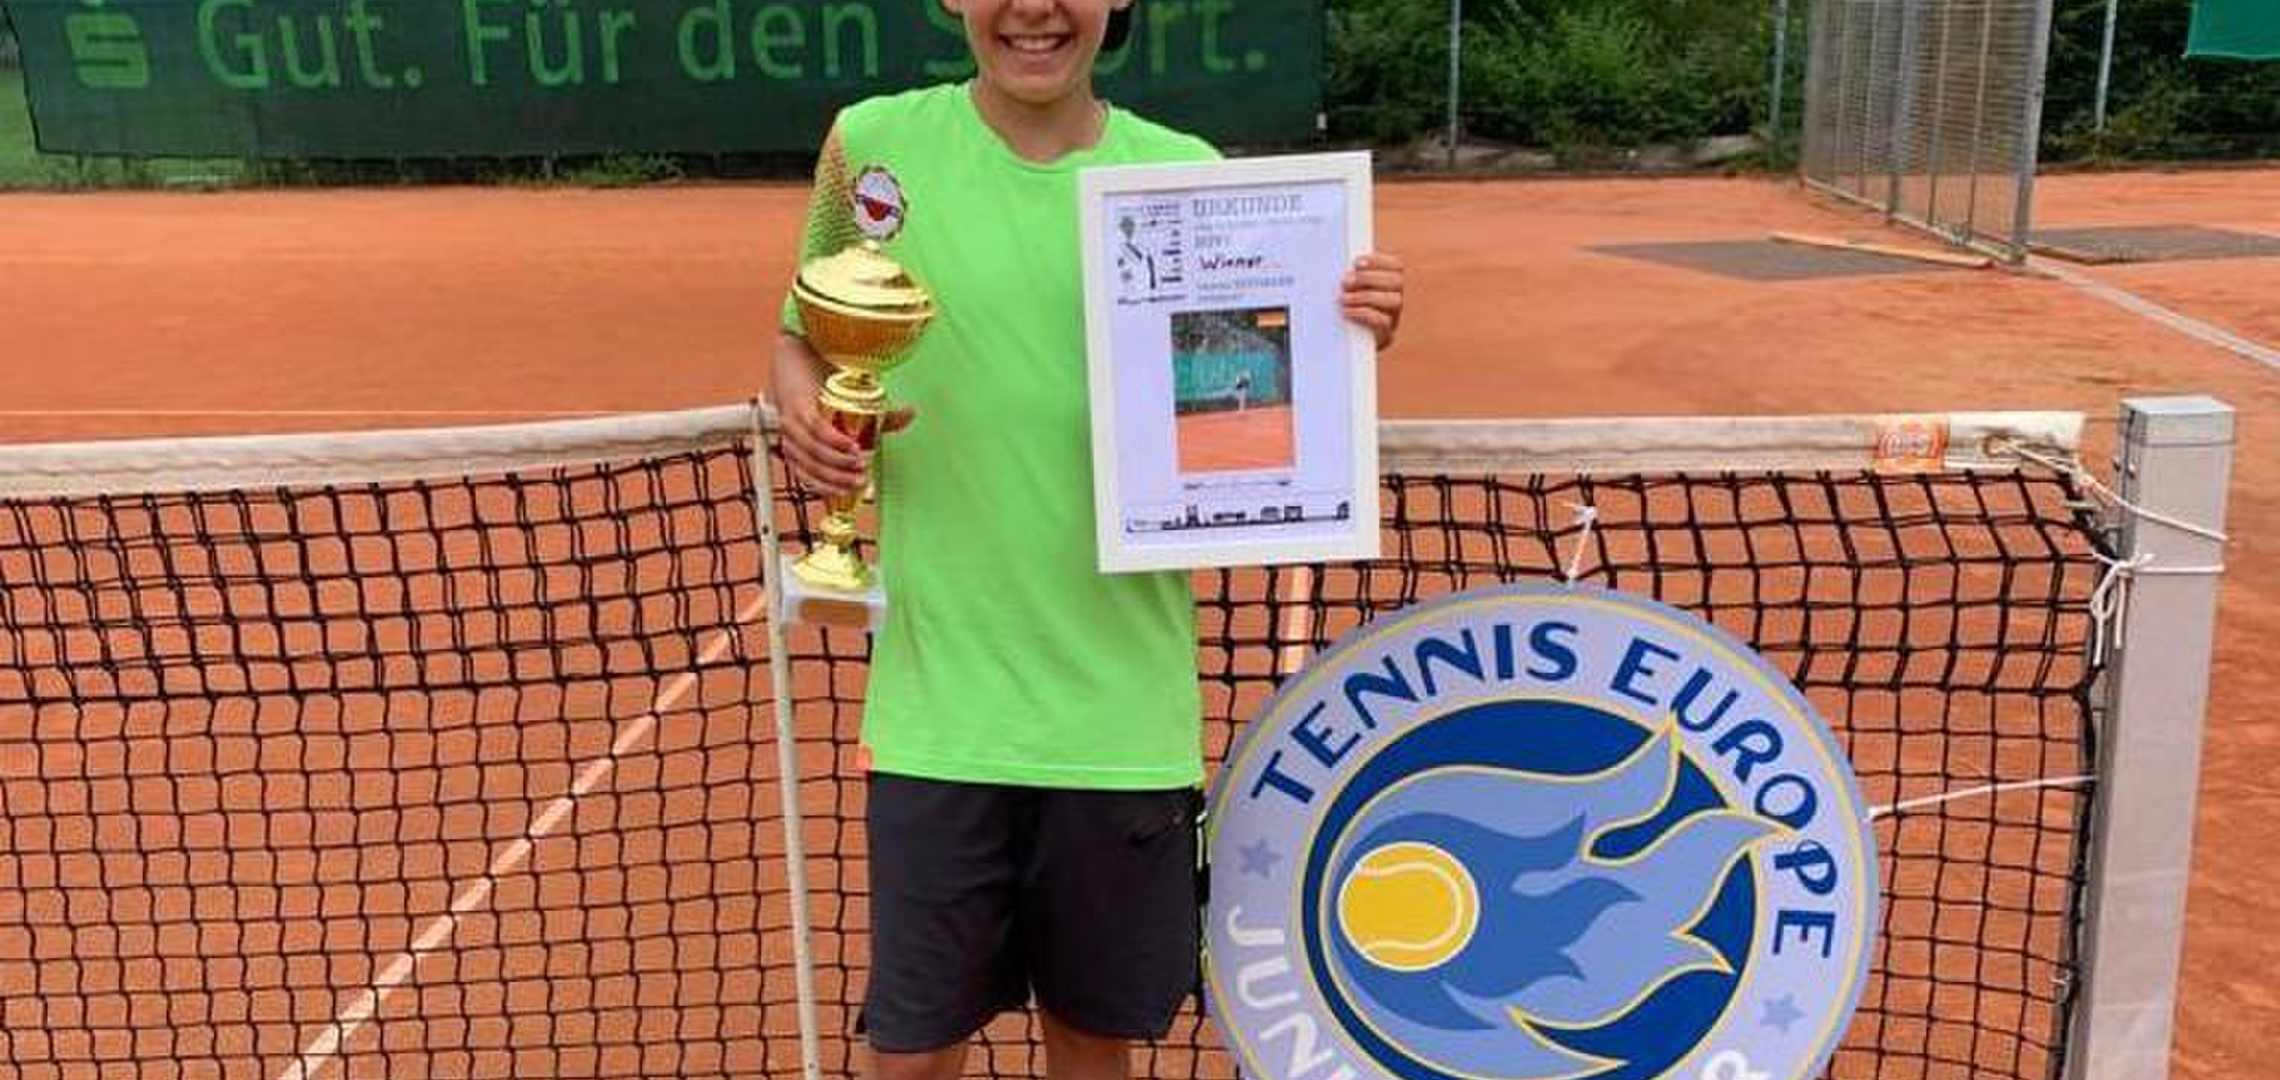 Int Tennisverband